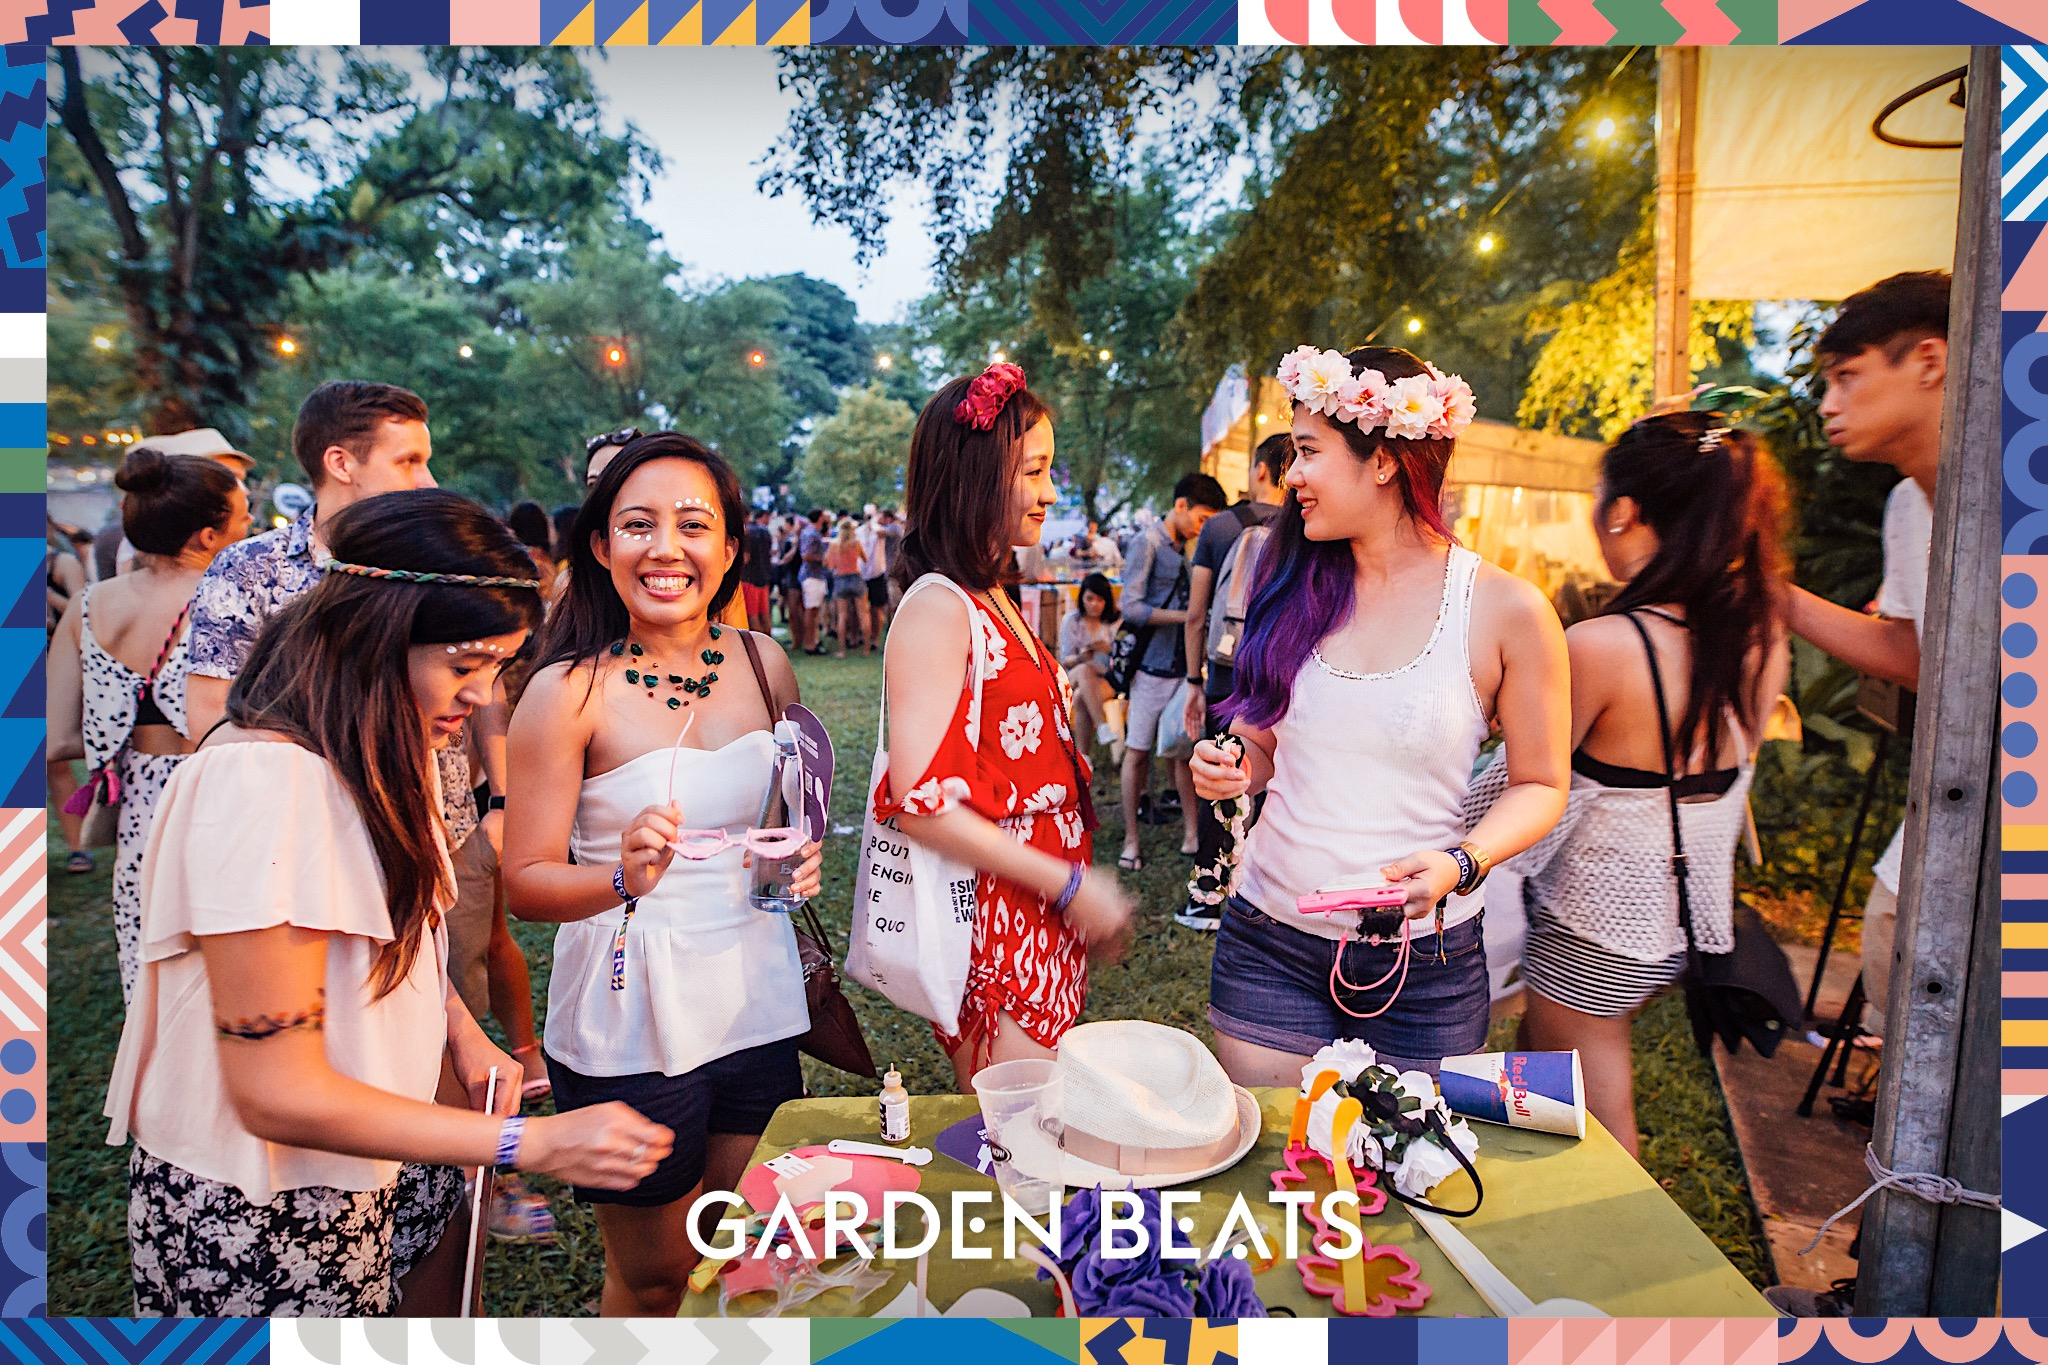 18032017_GardenBeats_Colossal710_WatermarkedGB.jpg